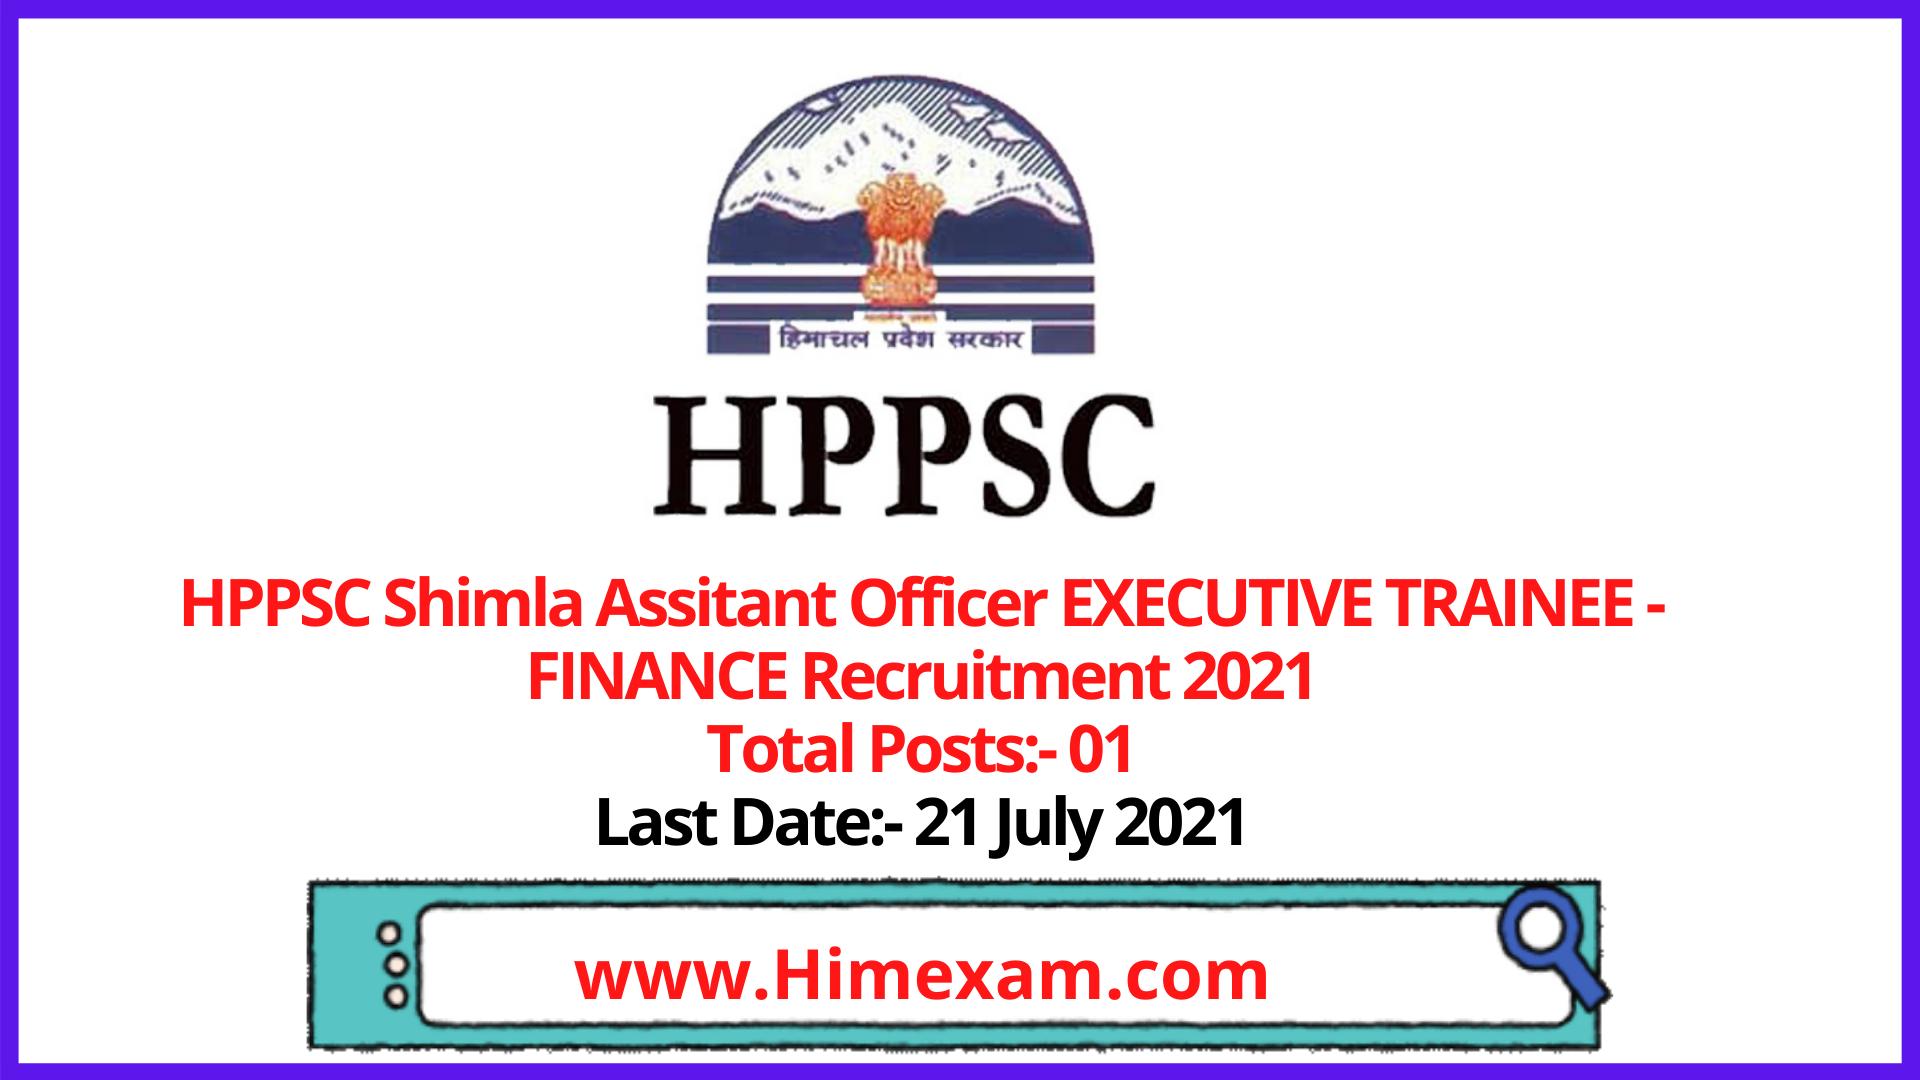 HPPSC Shimla  Assitant Officer EXECUTIVE TRAINEE - FINANCE Recruitment 2021